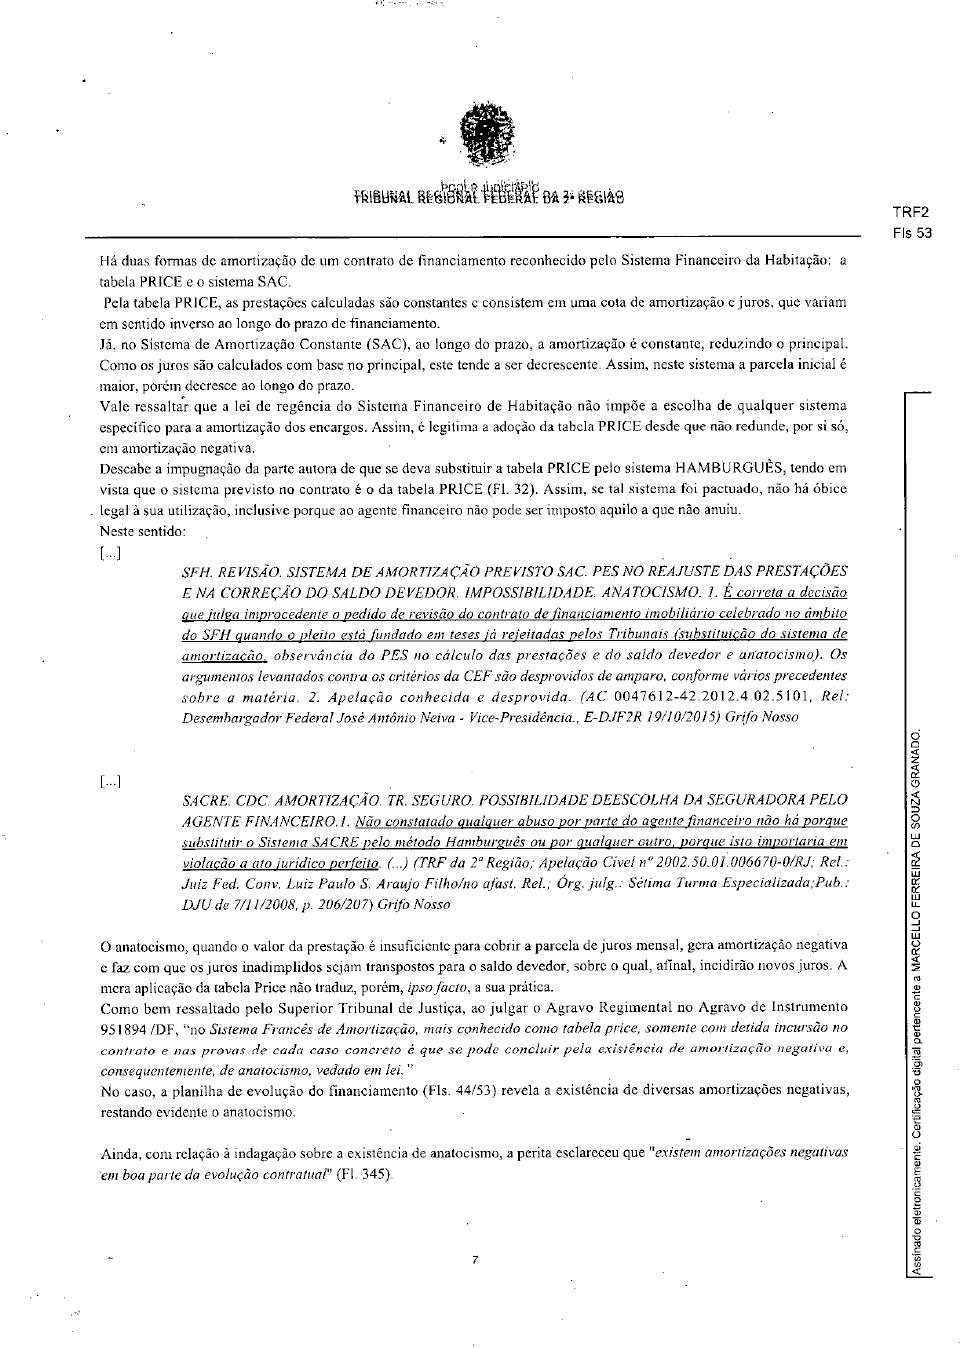 CARDOSO-11